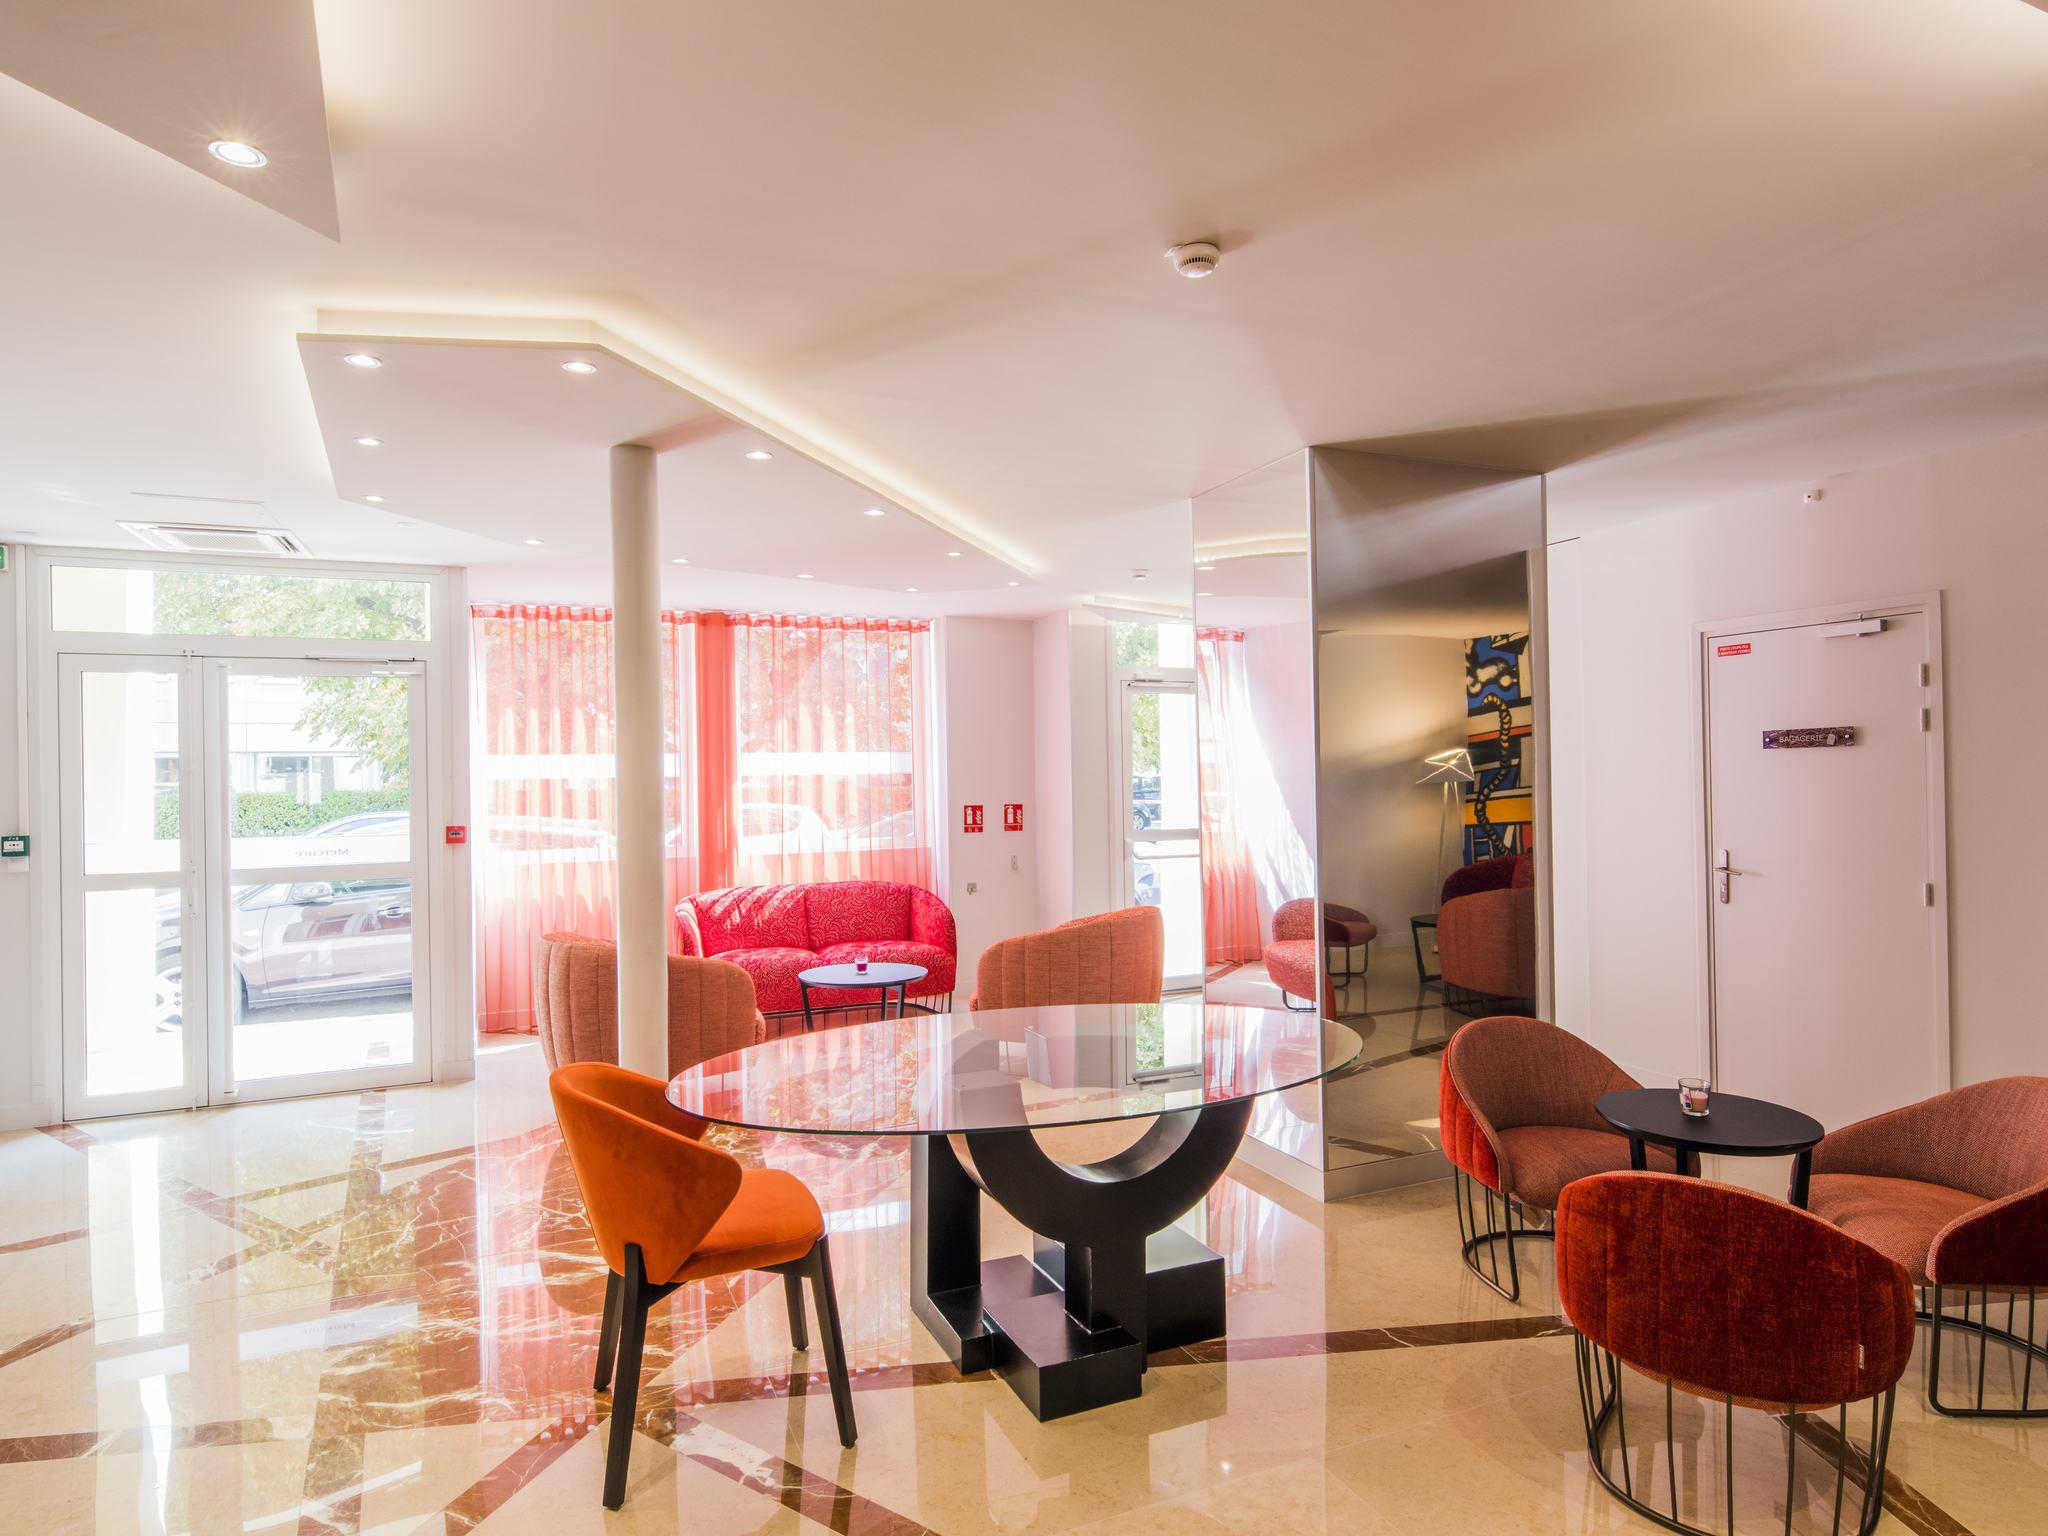 Hotel - Mercure Paris Pont de Levallois Neuilly (opening June 2018)